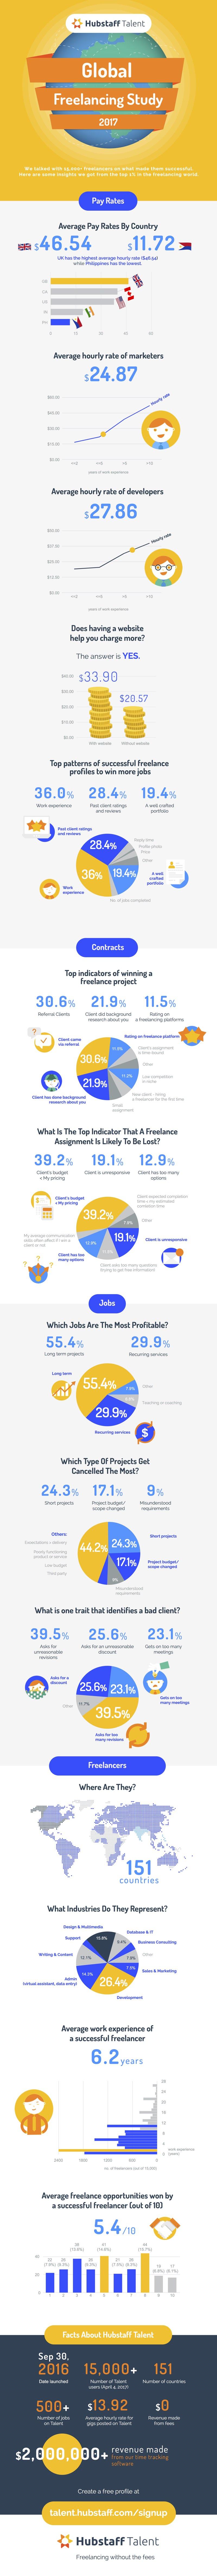 Hubstaff Talent's 2017 freelancing trends study infographic